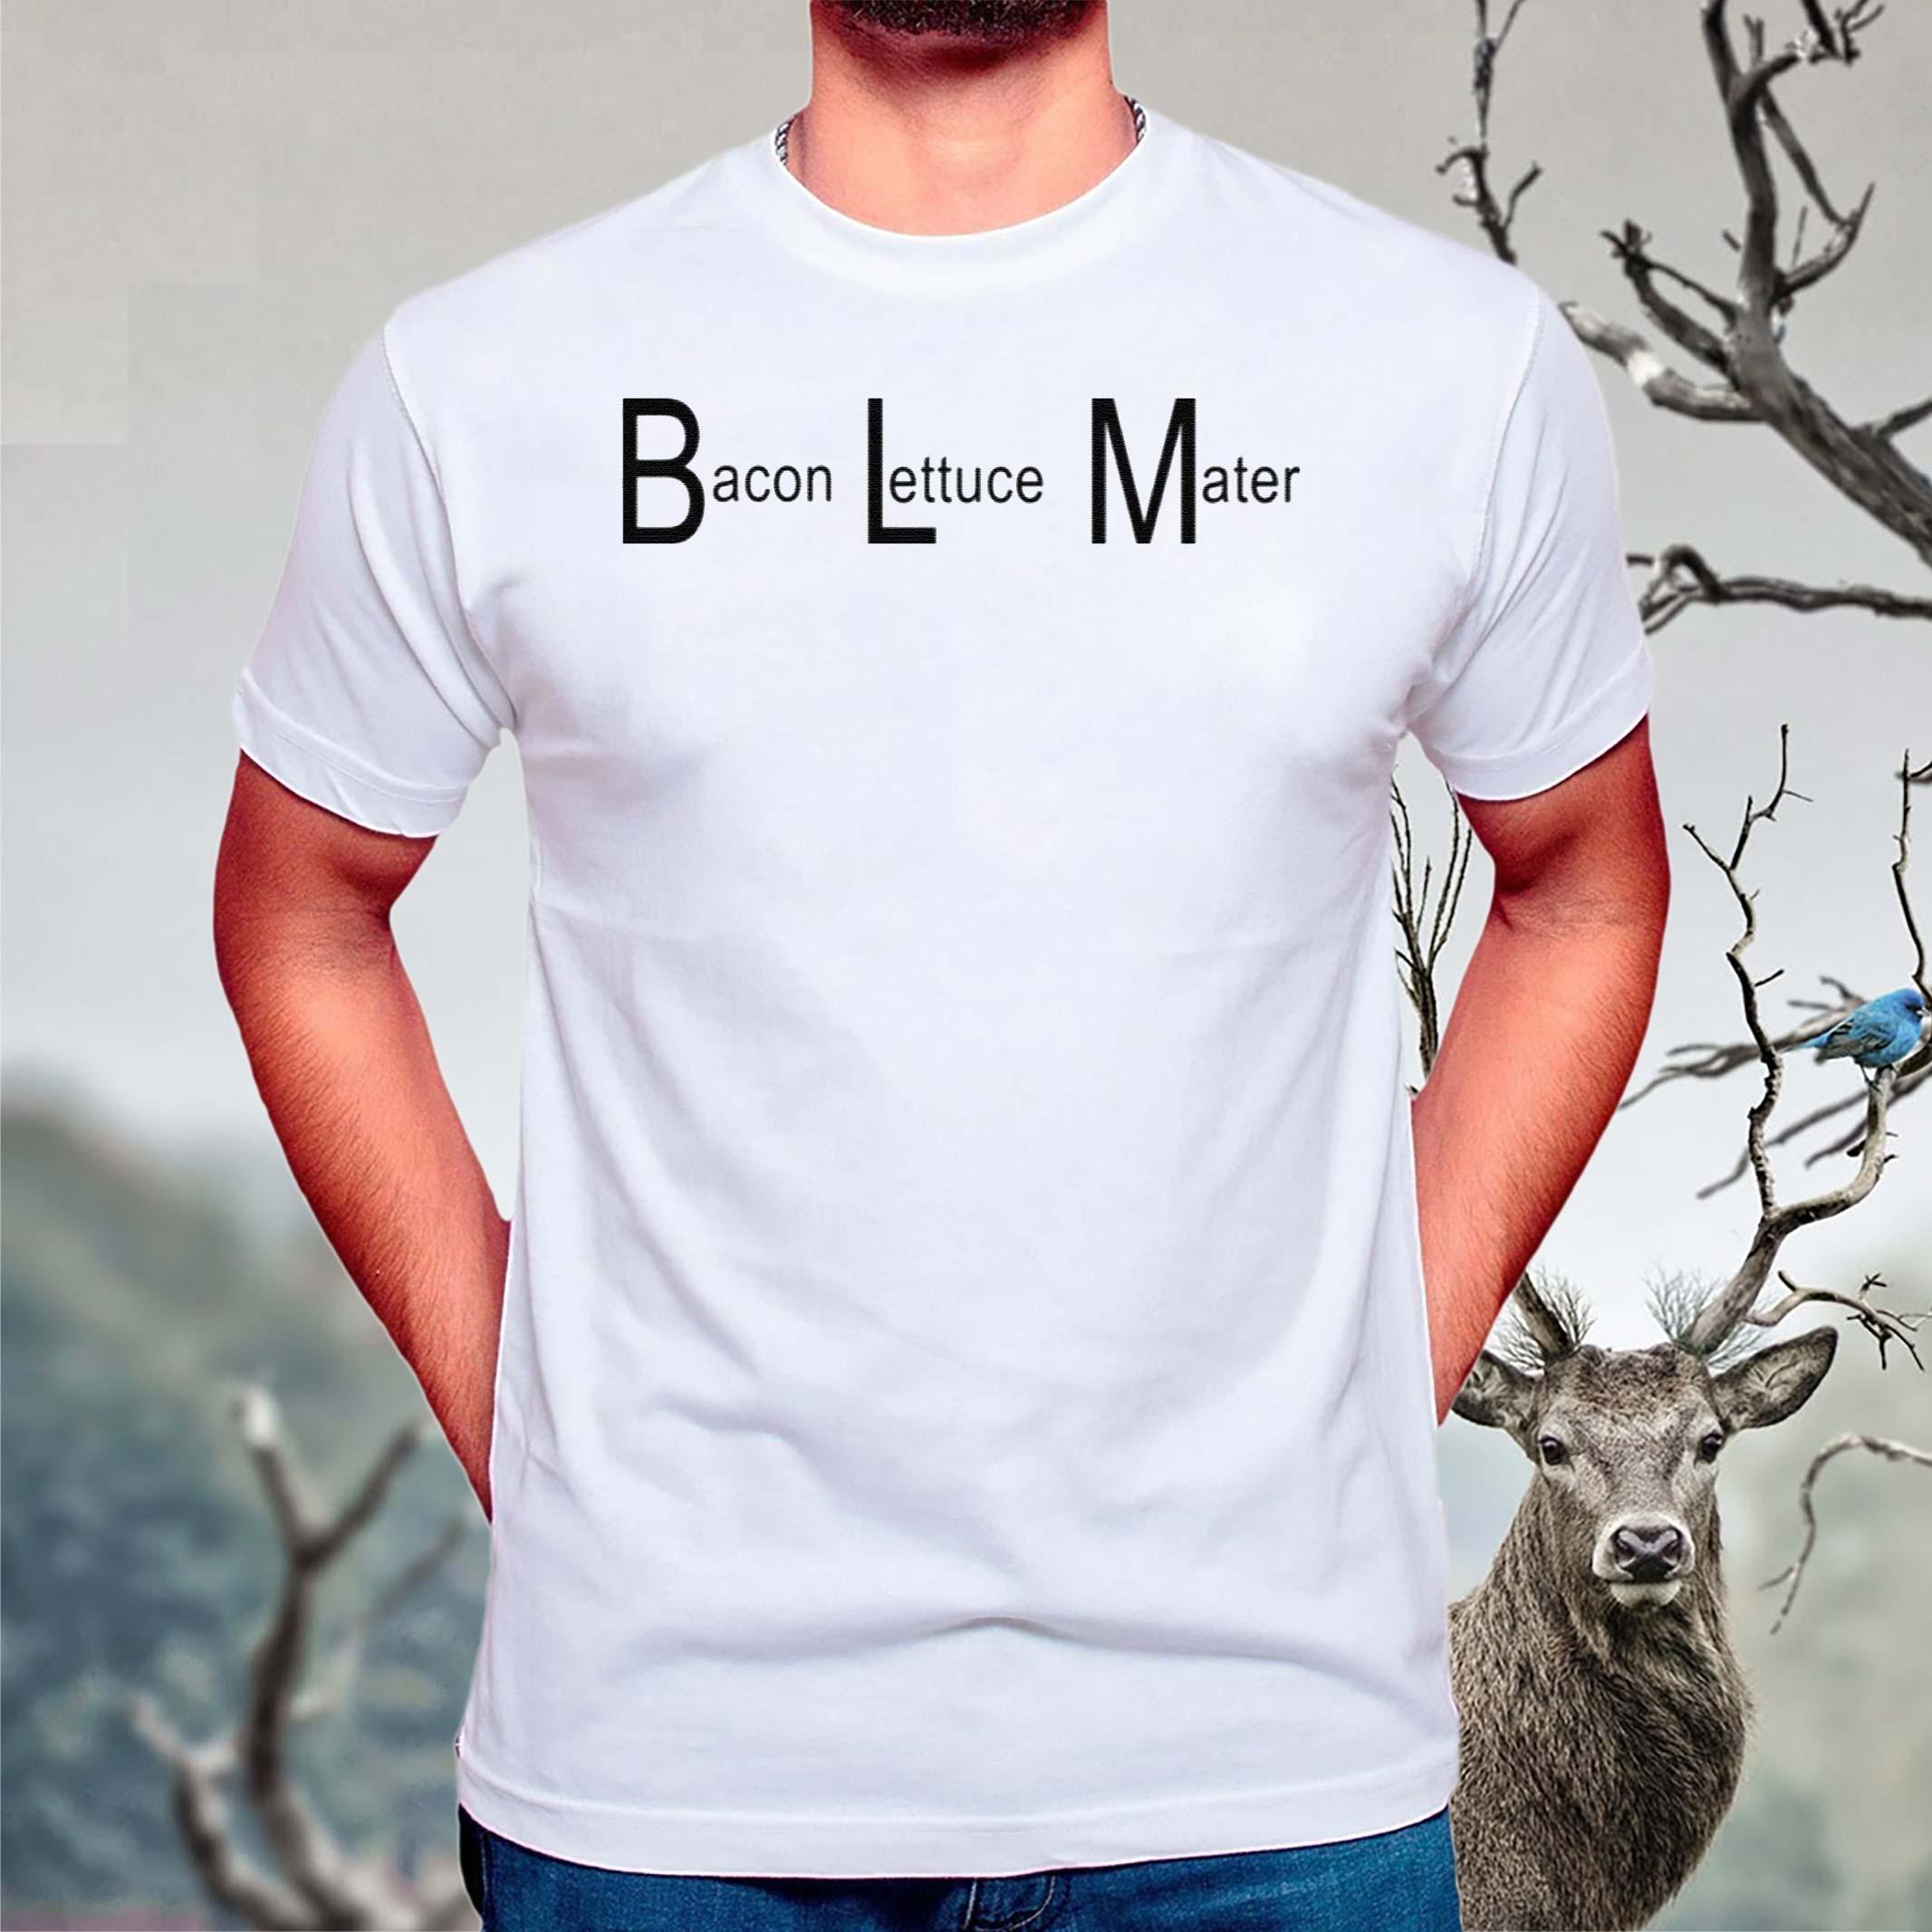 BLM-Bacon-Lettuce-Mater-shirt